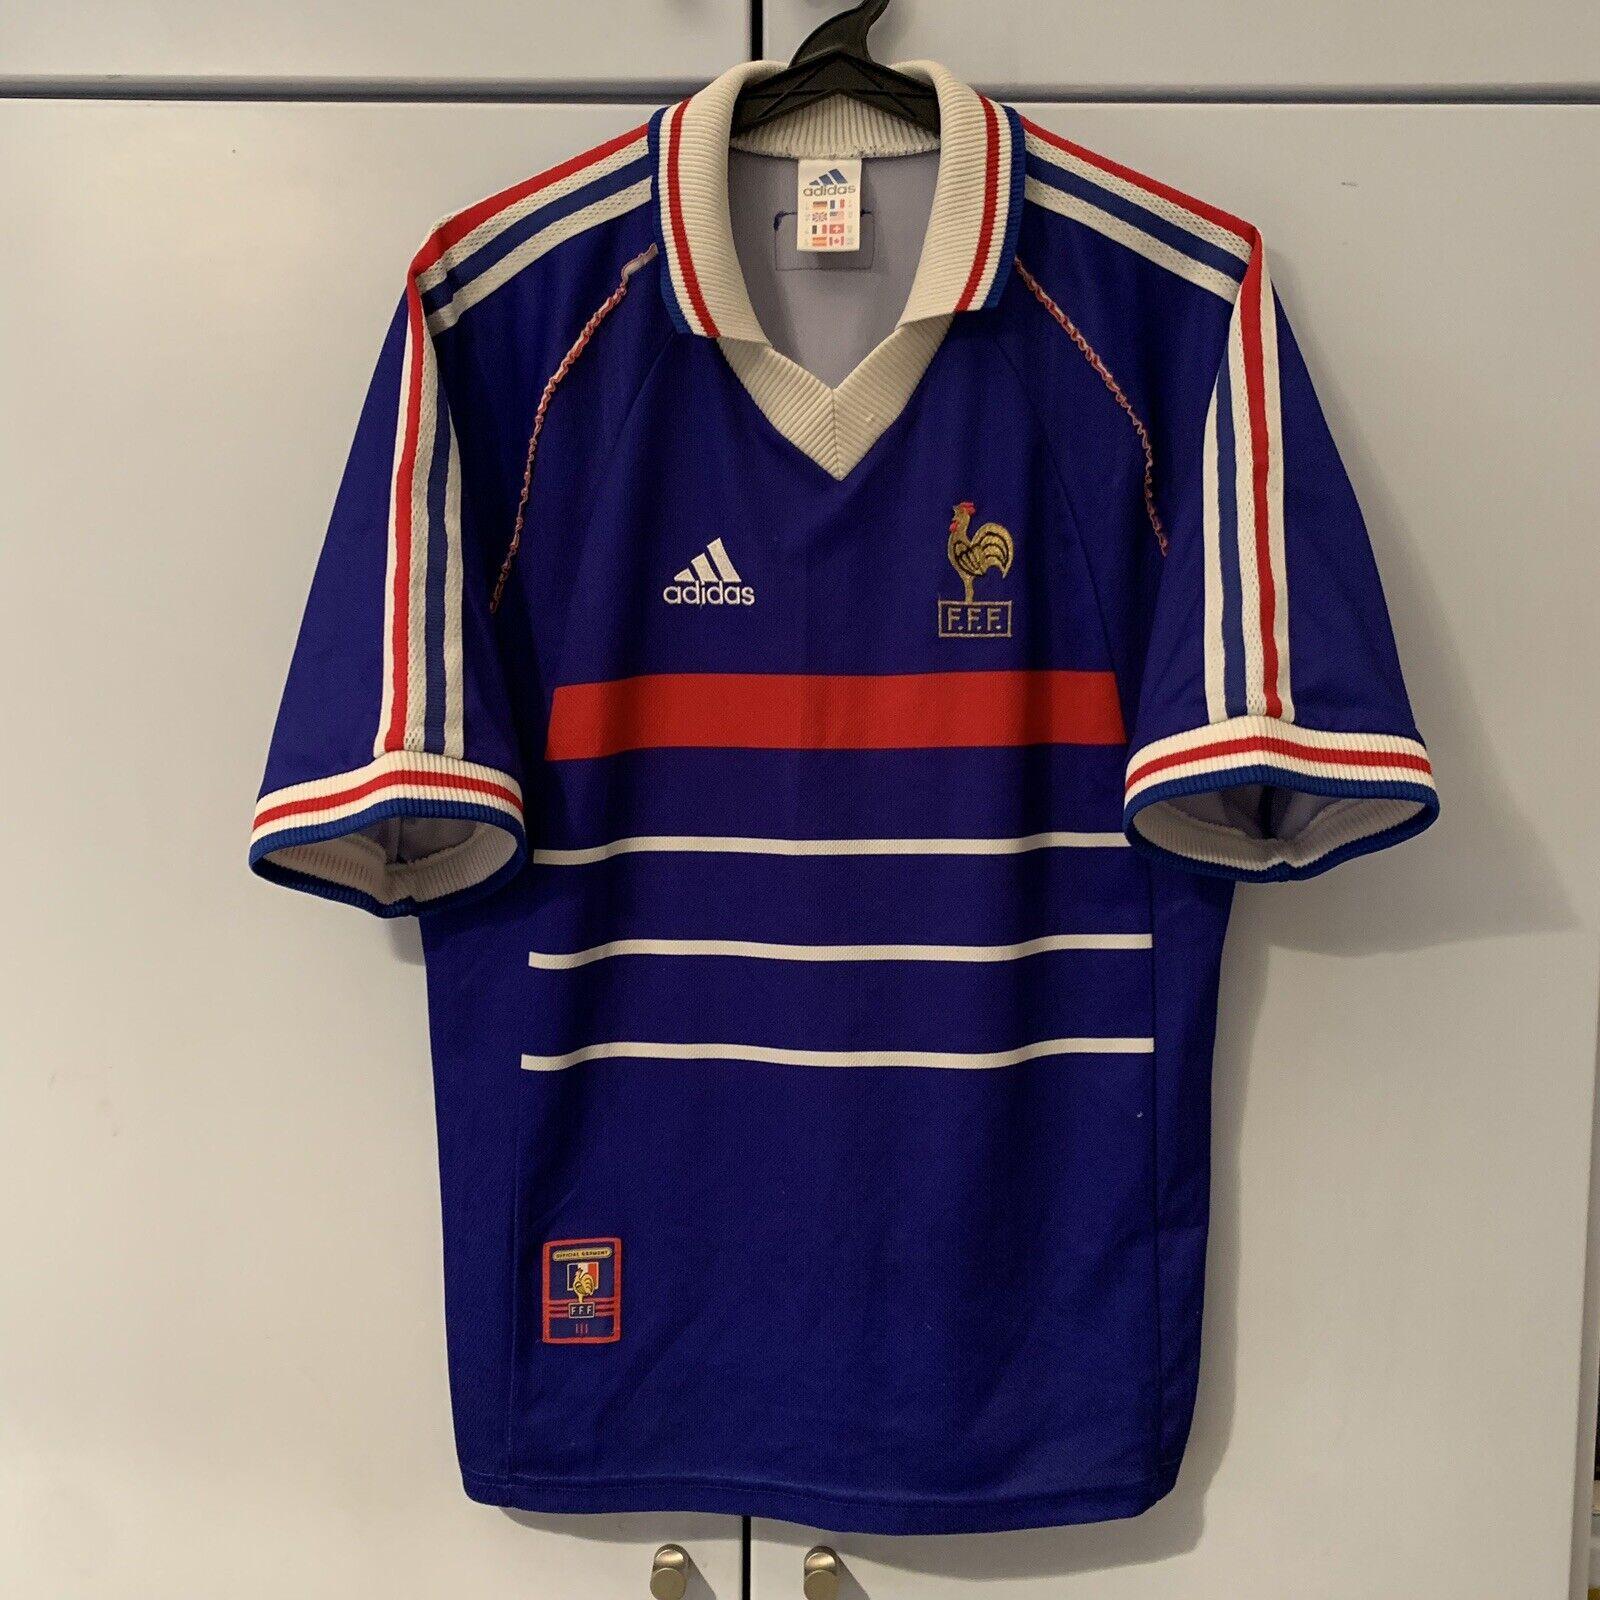 Maillot De Footbtutti Zidane France French squadra Shirt Maglia 1998 World Cup Jersey